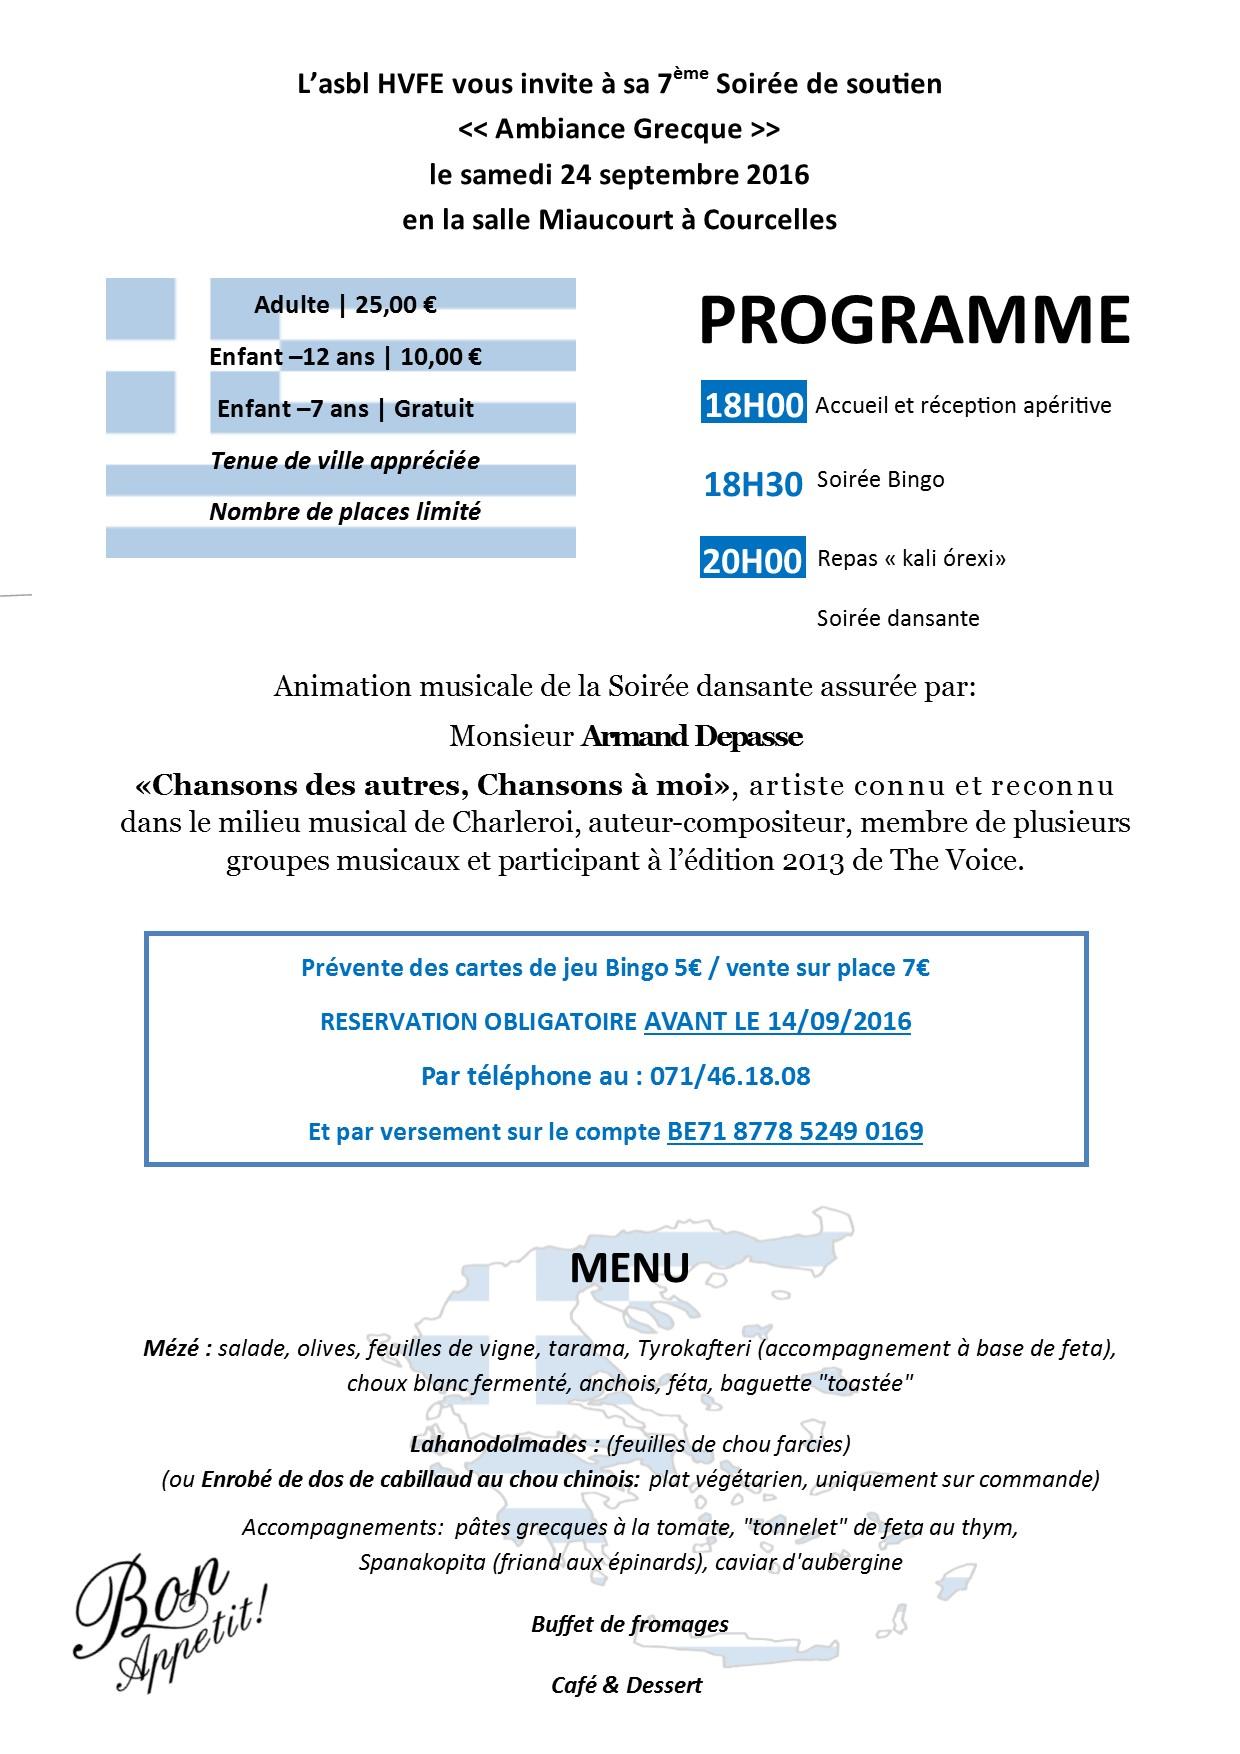 Invitation pour facebook 2 ok 24-09-2016 grèce